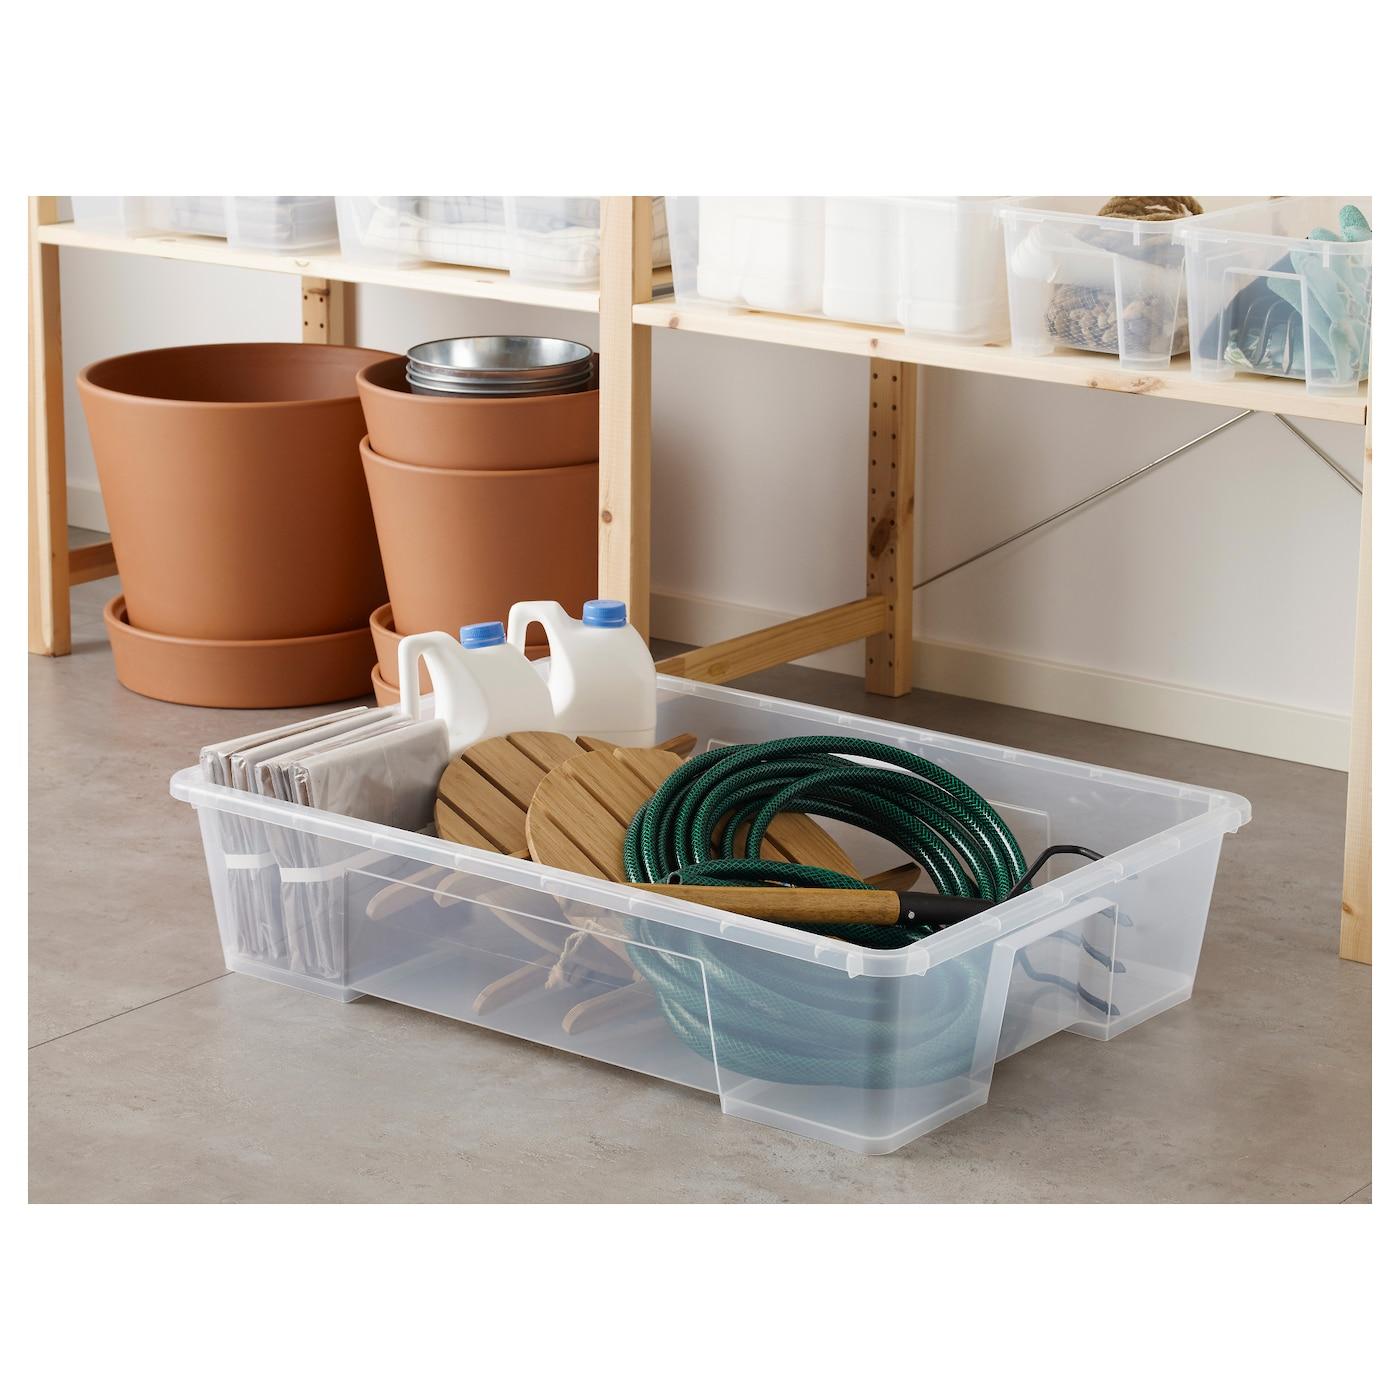 SAMLA kutija providno 78 cm 56 cm 18 cm 55 l